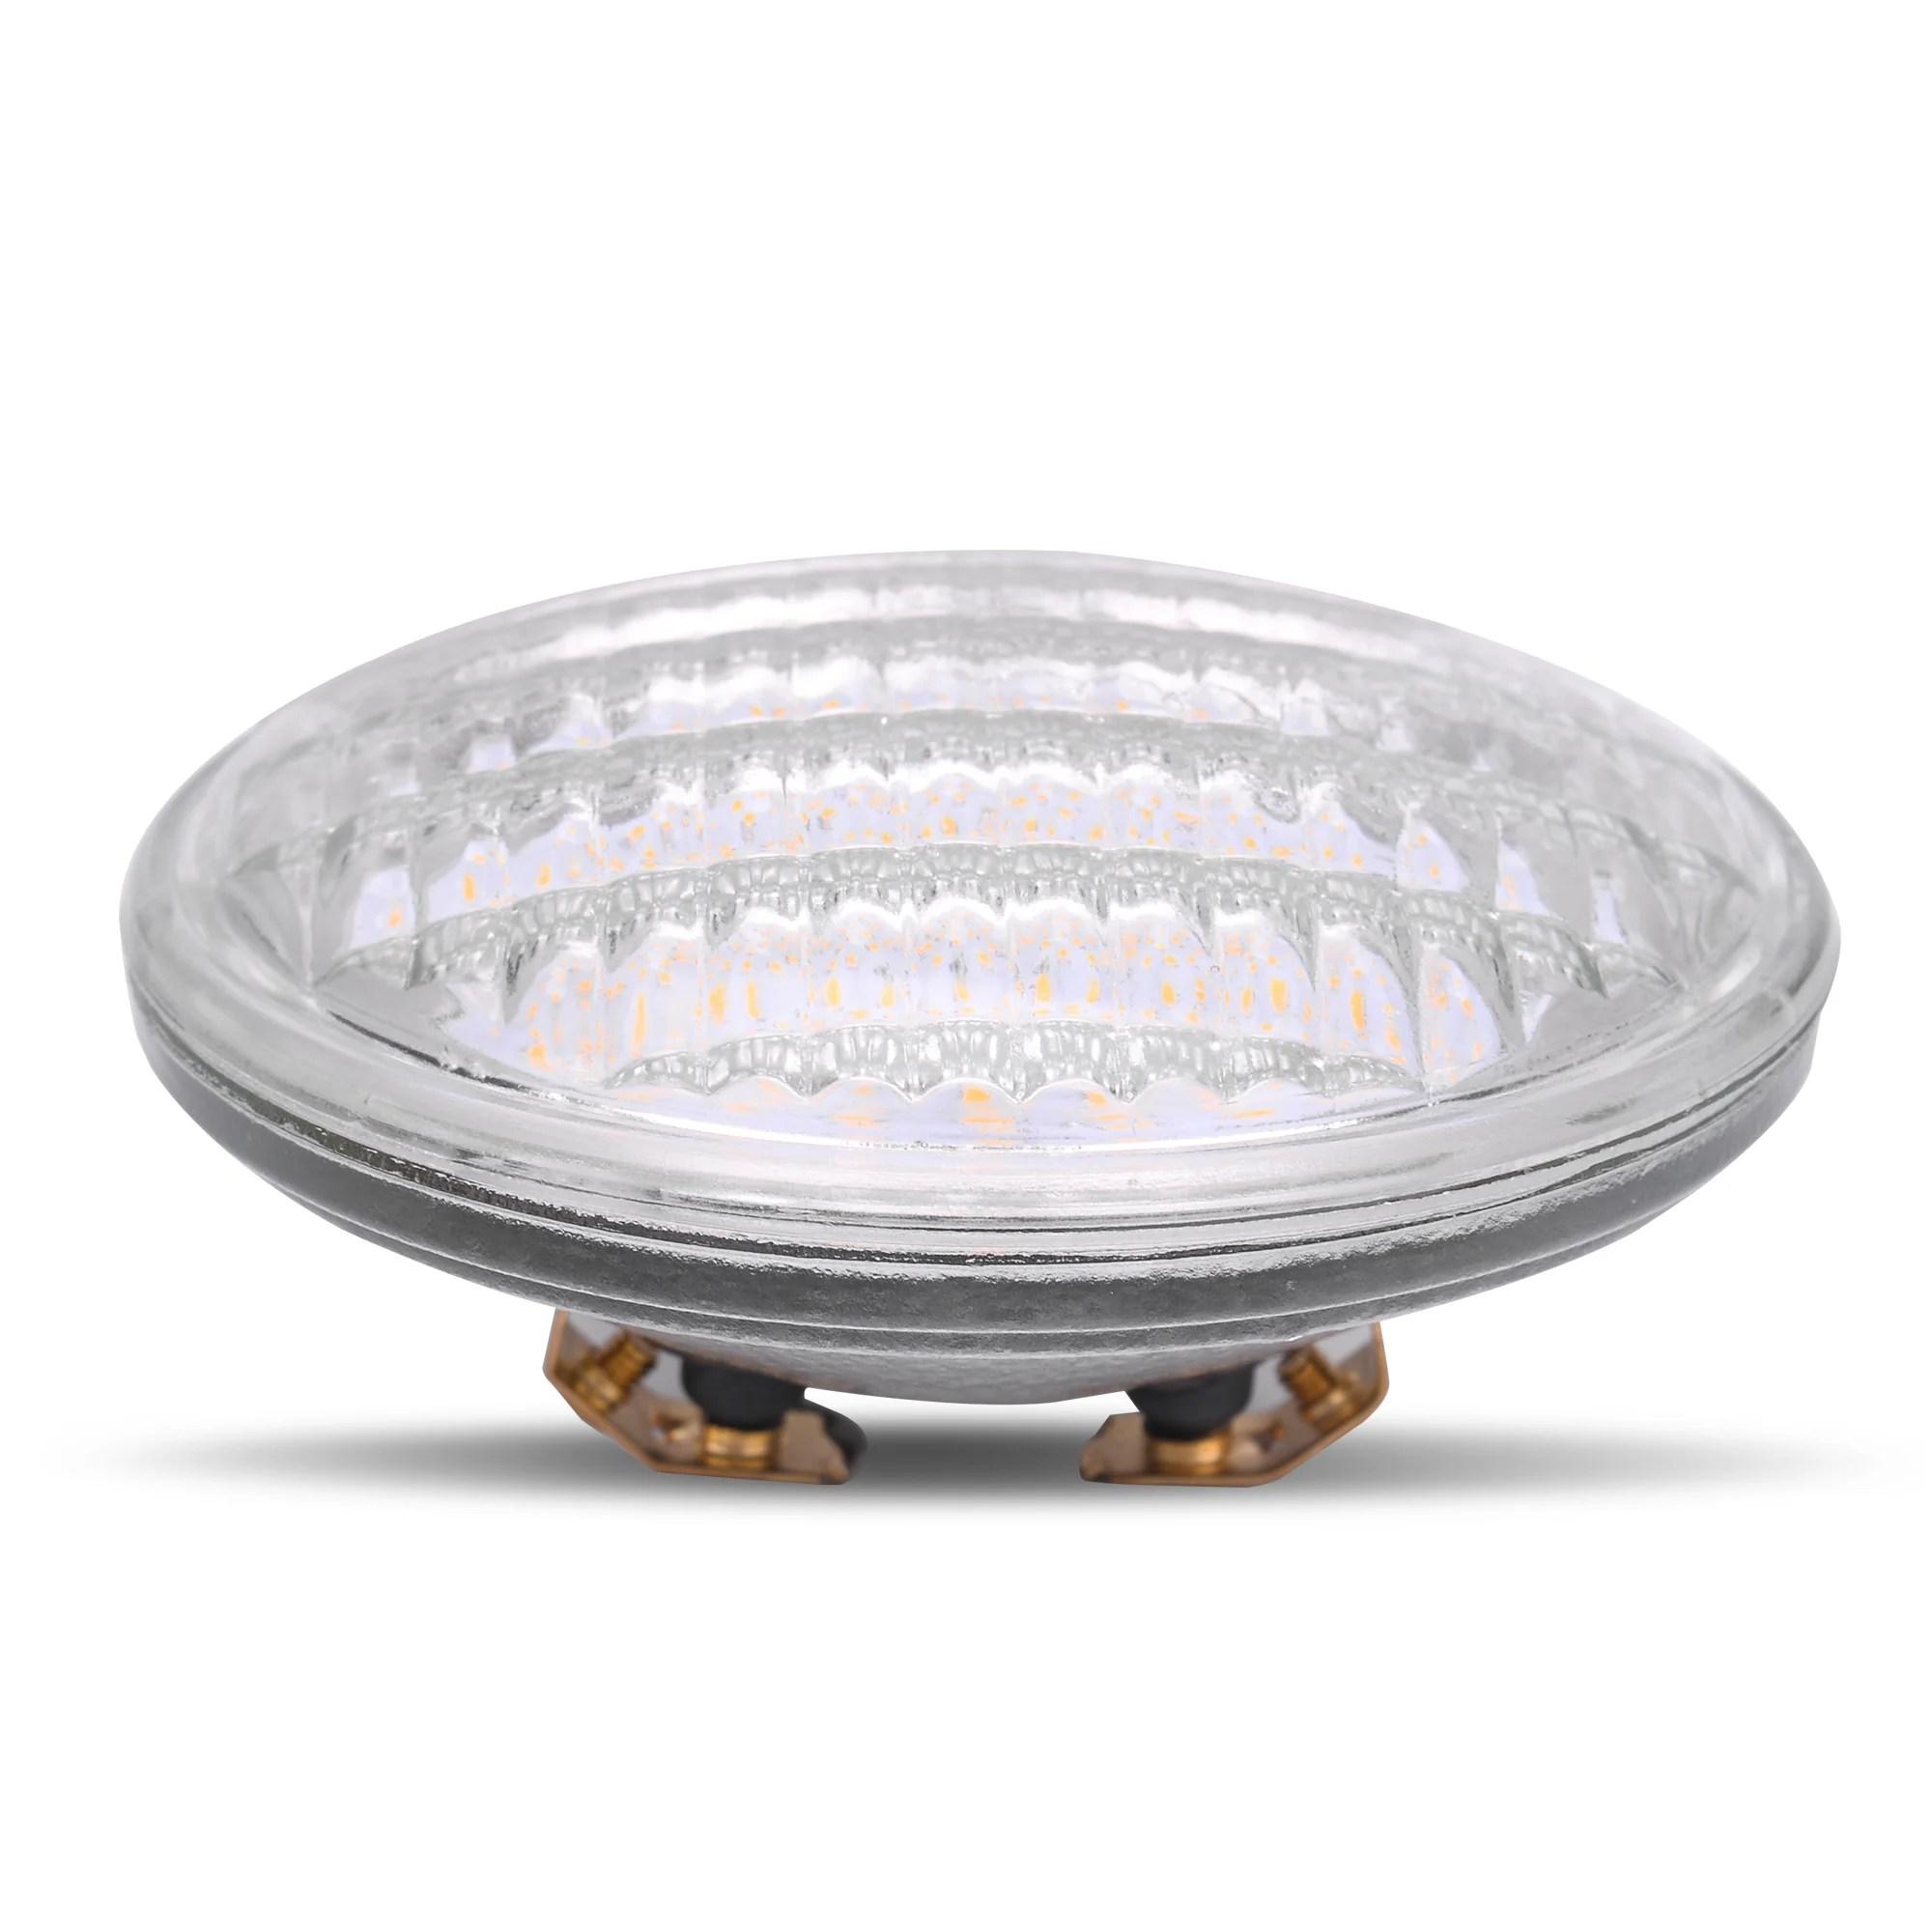 medium resolution of par36 ac dc 12 volt ar111 12 watt led replacement light bulb landscape lamp